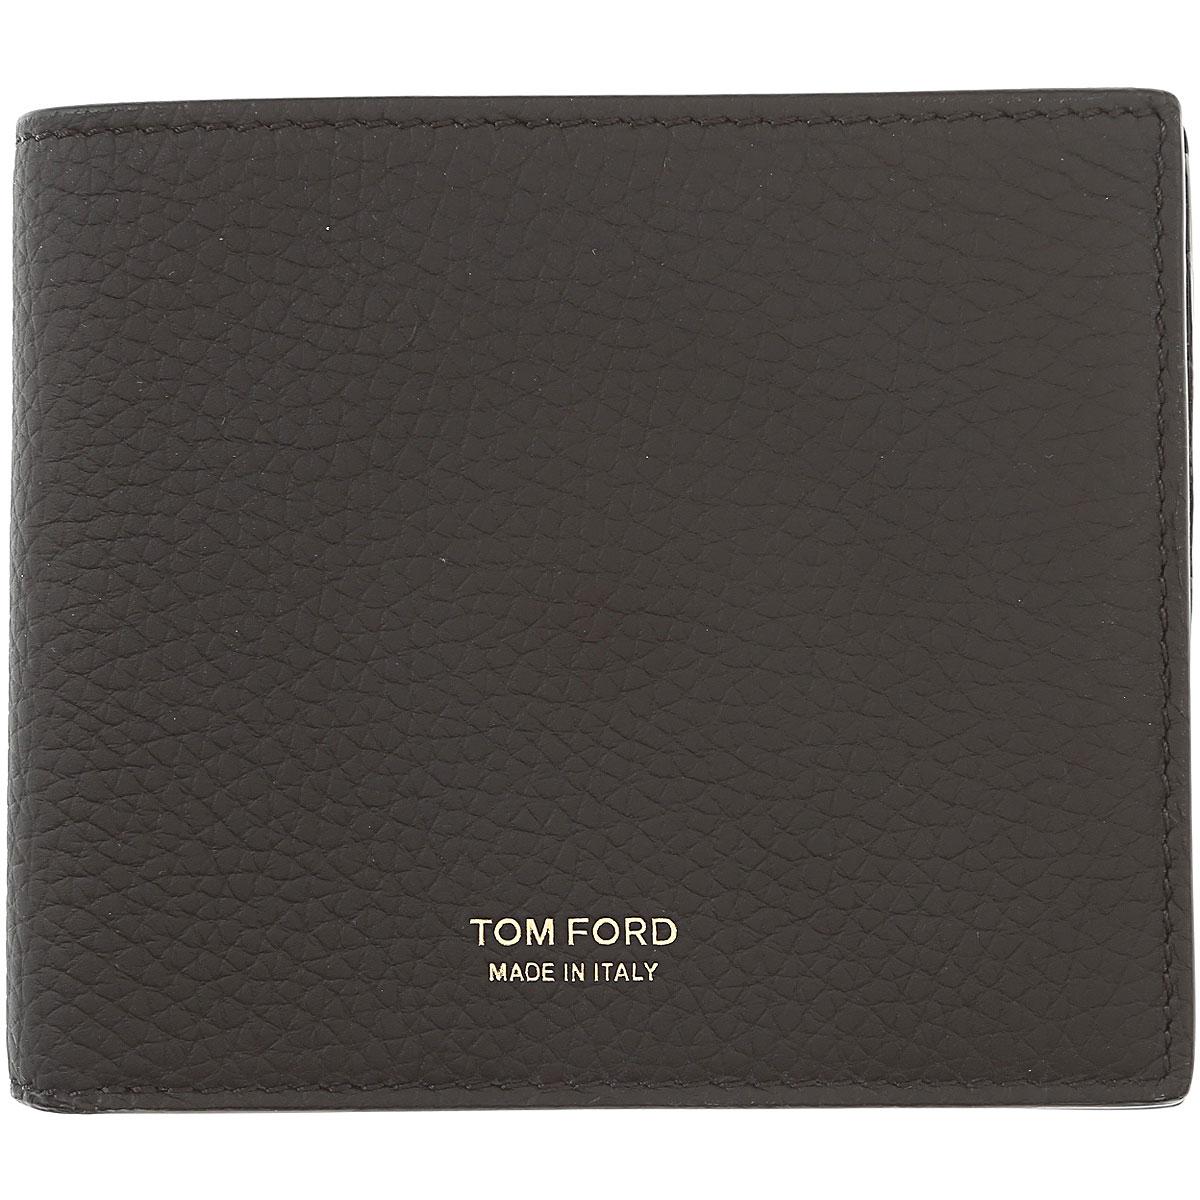 Image of Tom Ford Mens Wallets, Black, Leather, 2017